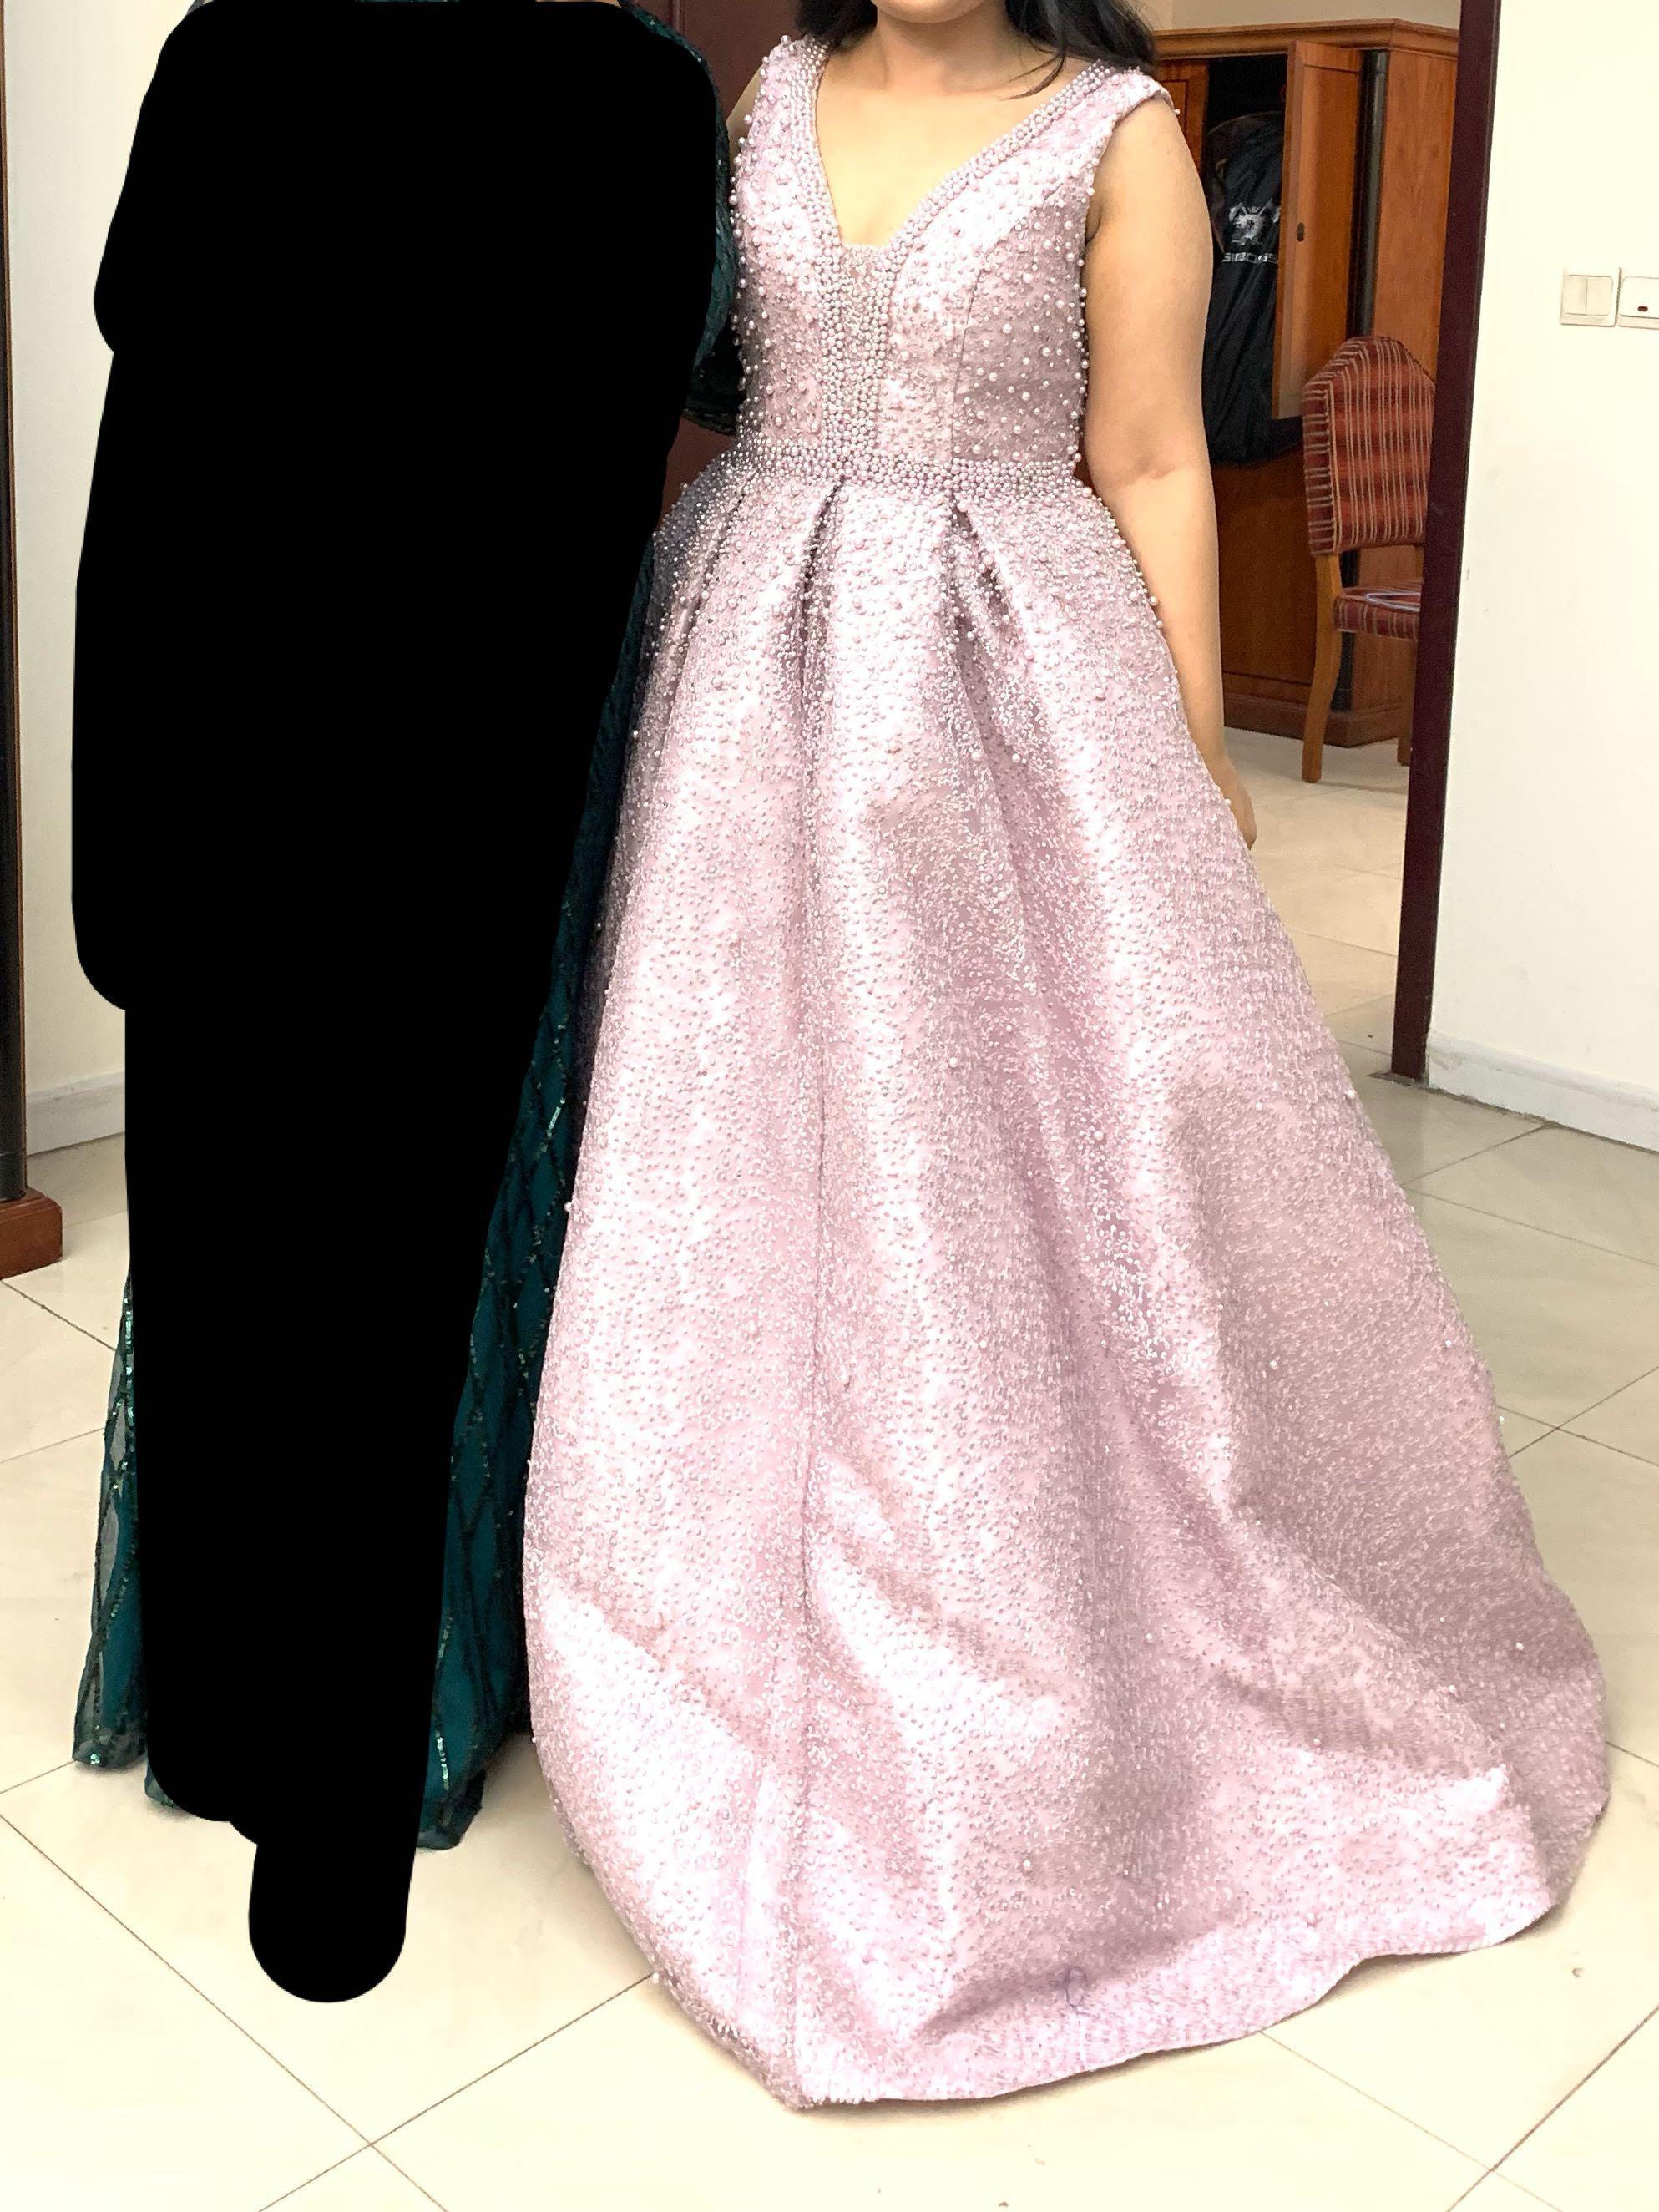 Duchess Boutique formal engagement wedding maxi dress gown lilac